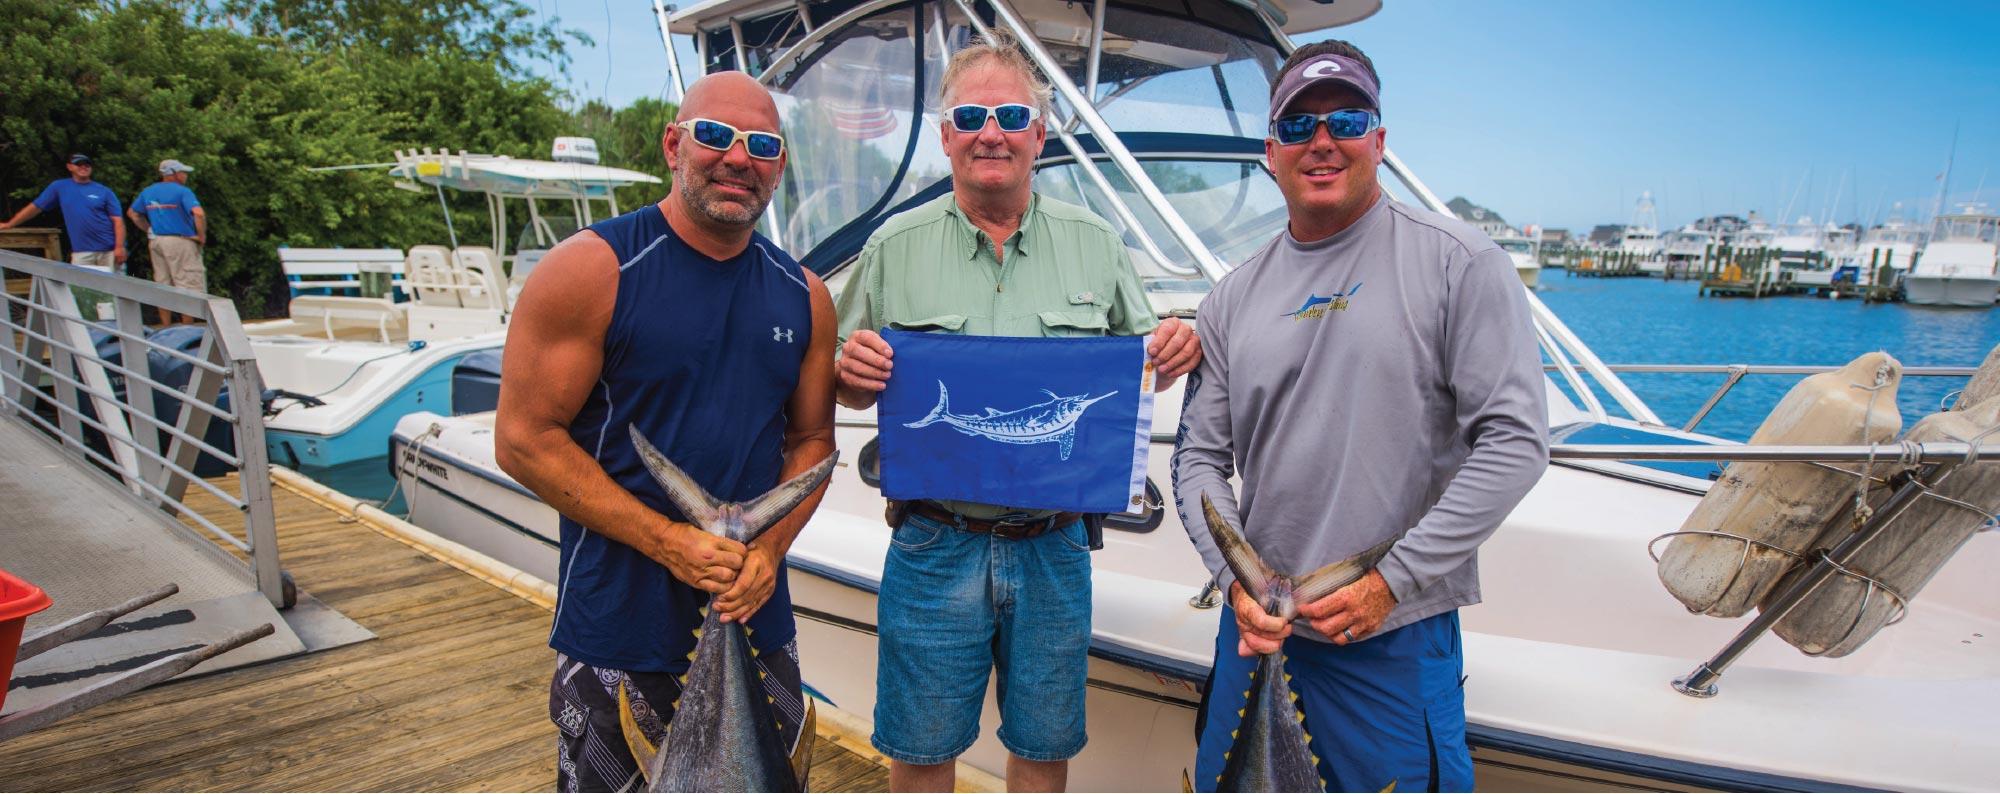 Three men with Tuna and Marlin flag